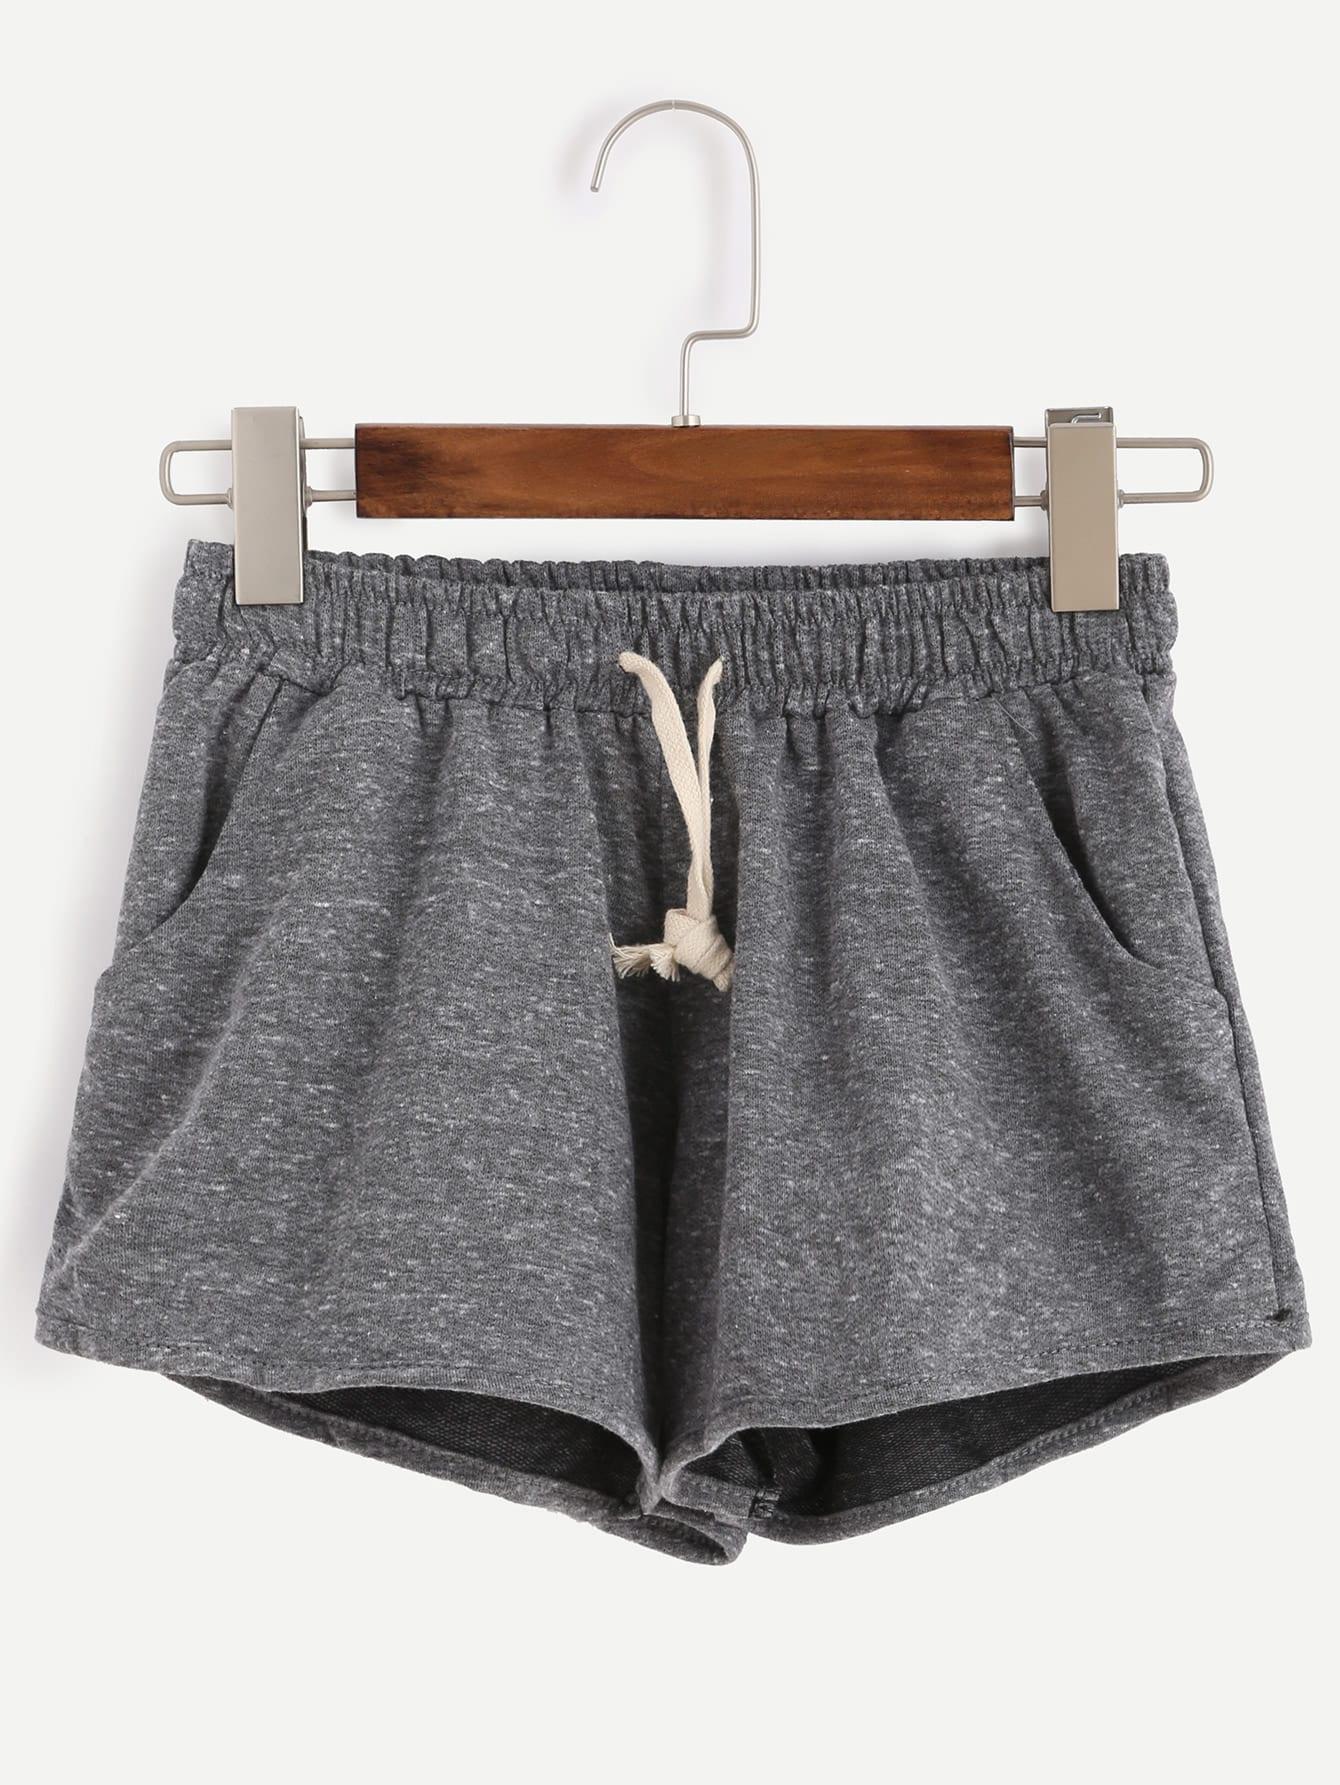 Marled Knit Drawstring Waist Shorts